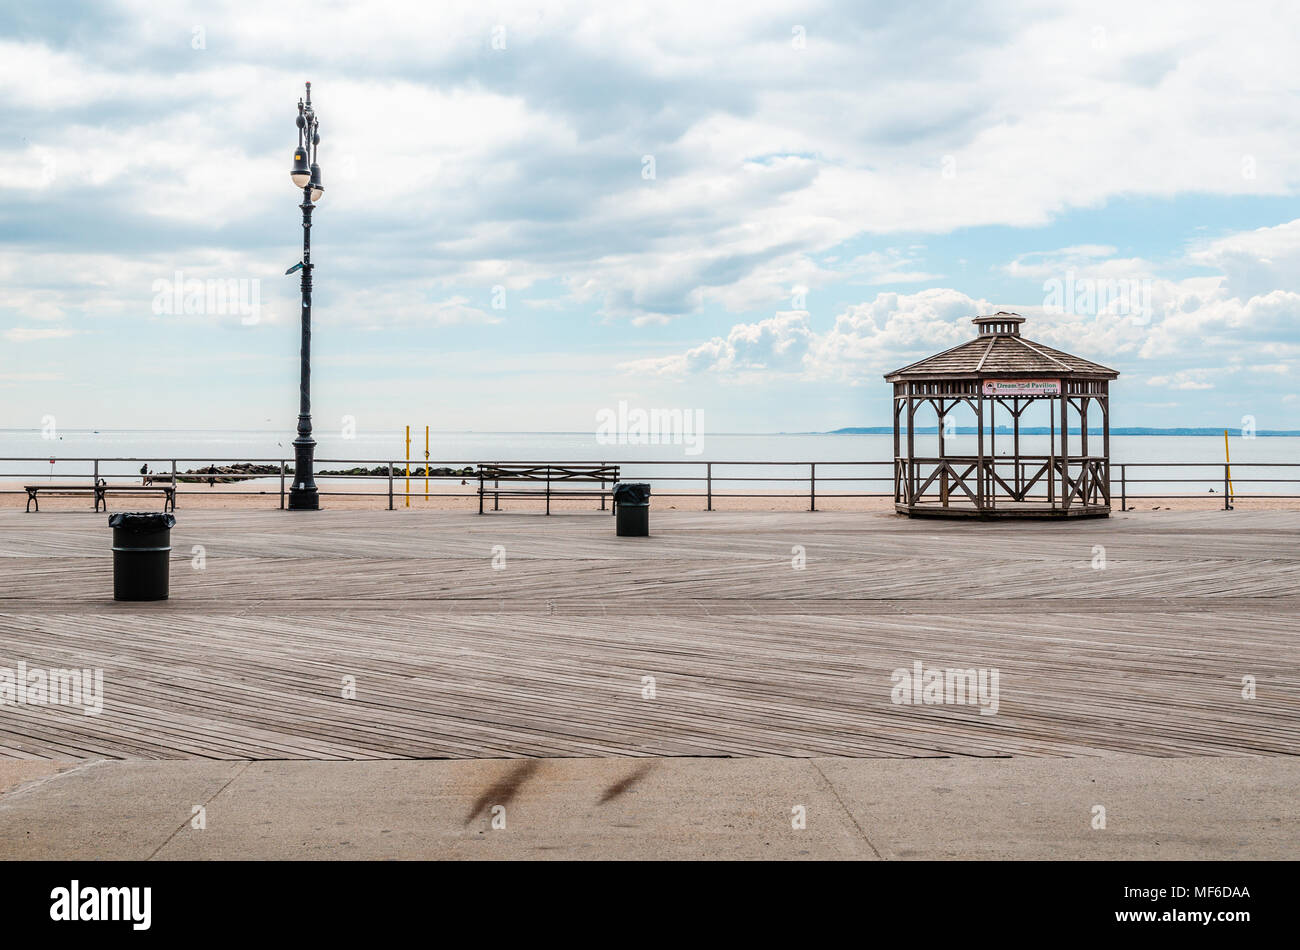 Coney Island Beach, New York City (NYC) - Stock Image